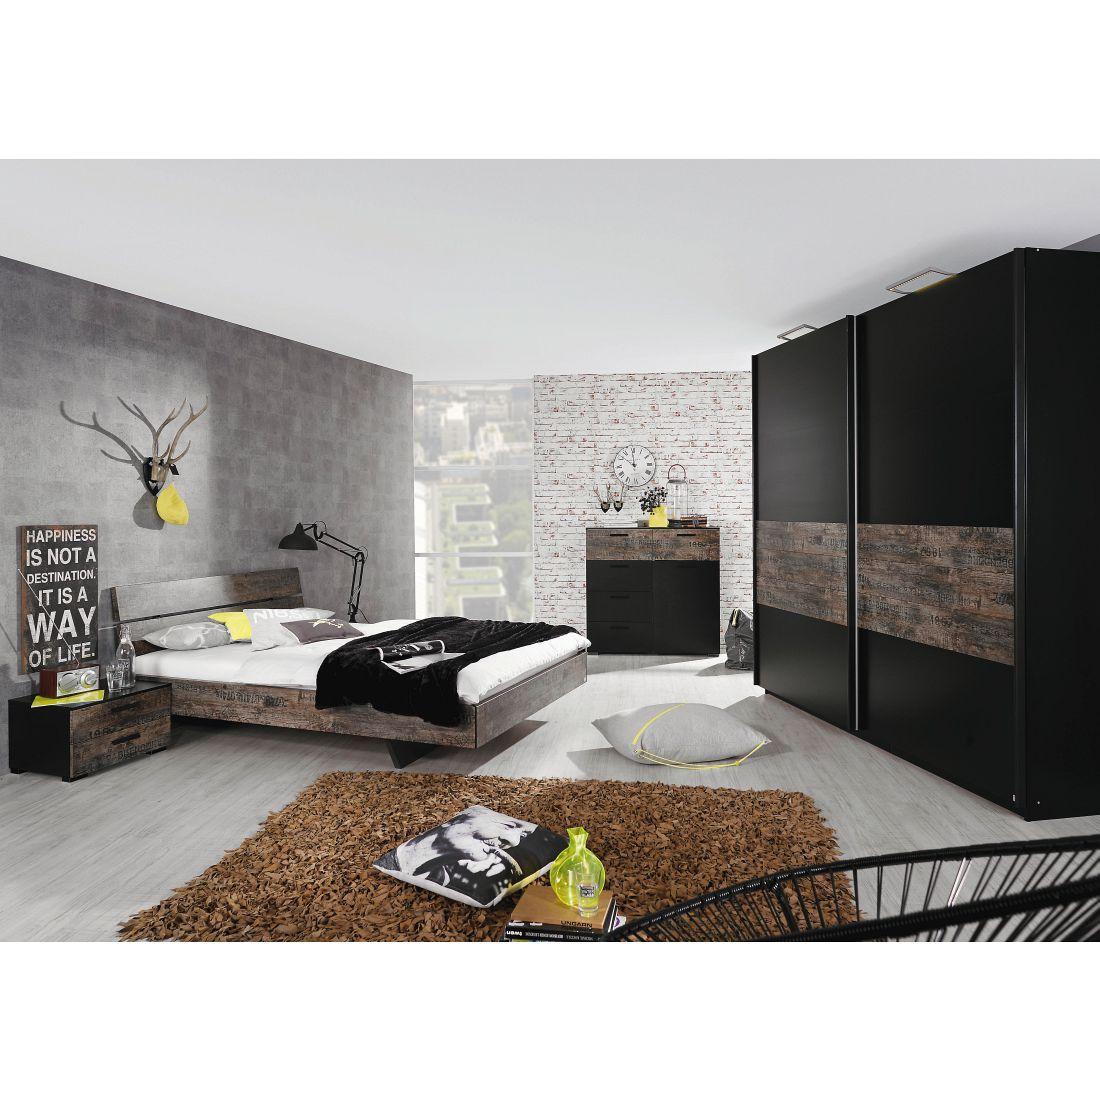 ... Vintage Braun   Liegefläche Bett: 180 X 200cm, Rauch Select Jetzt  Bestellen Unter: Https://moebel.ladendirekt.de/schlafzimmer/komplett  Schlafzimmer/?uid ...